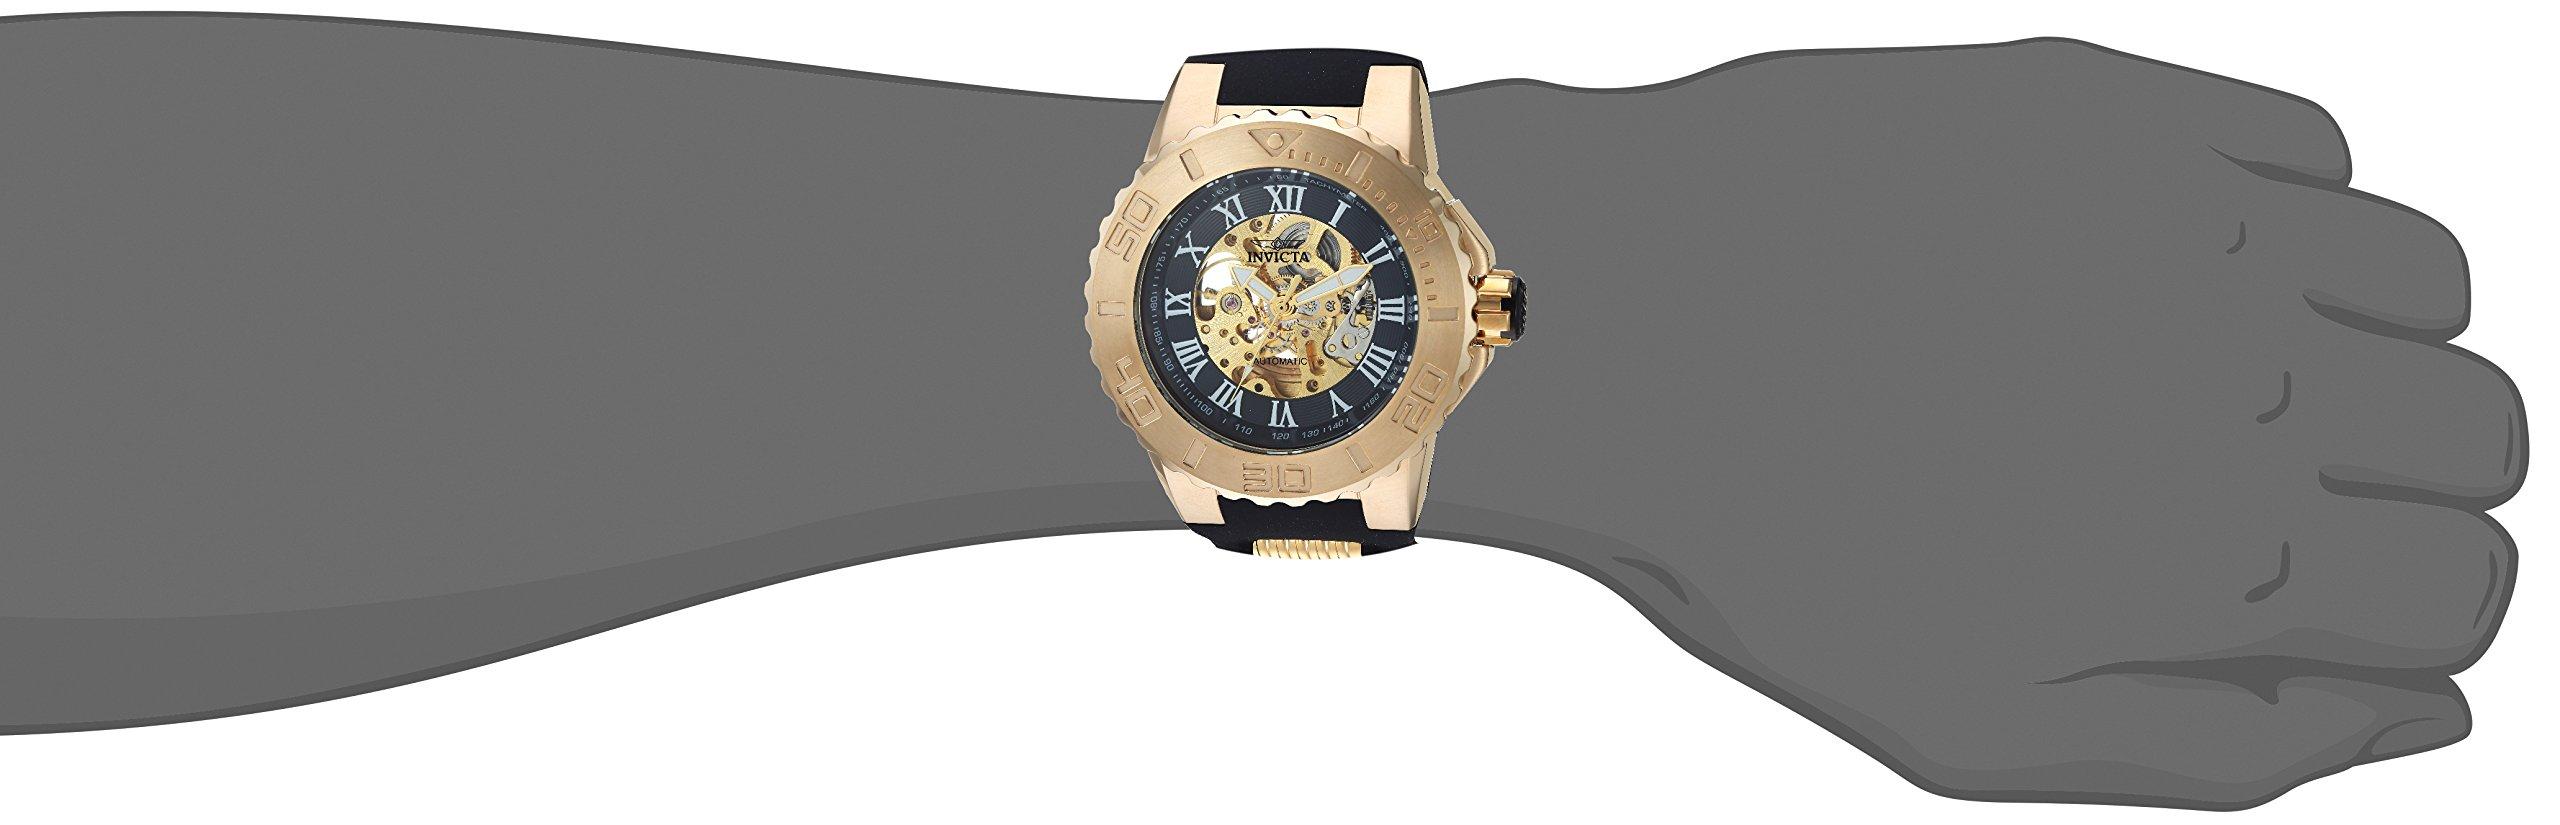 Invicta Analogue Black Dial Men's Watch -24742